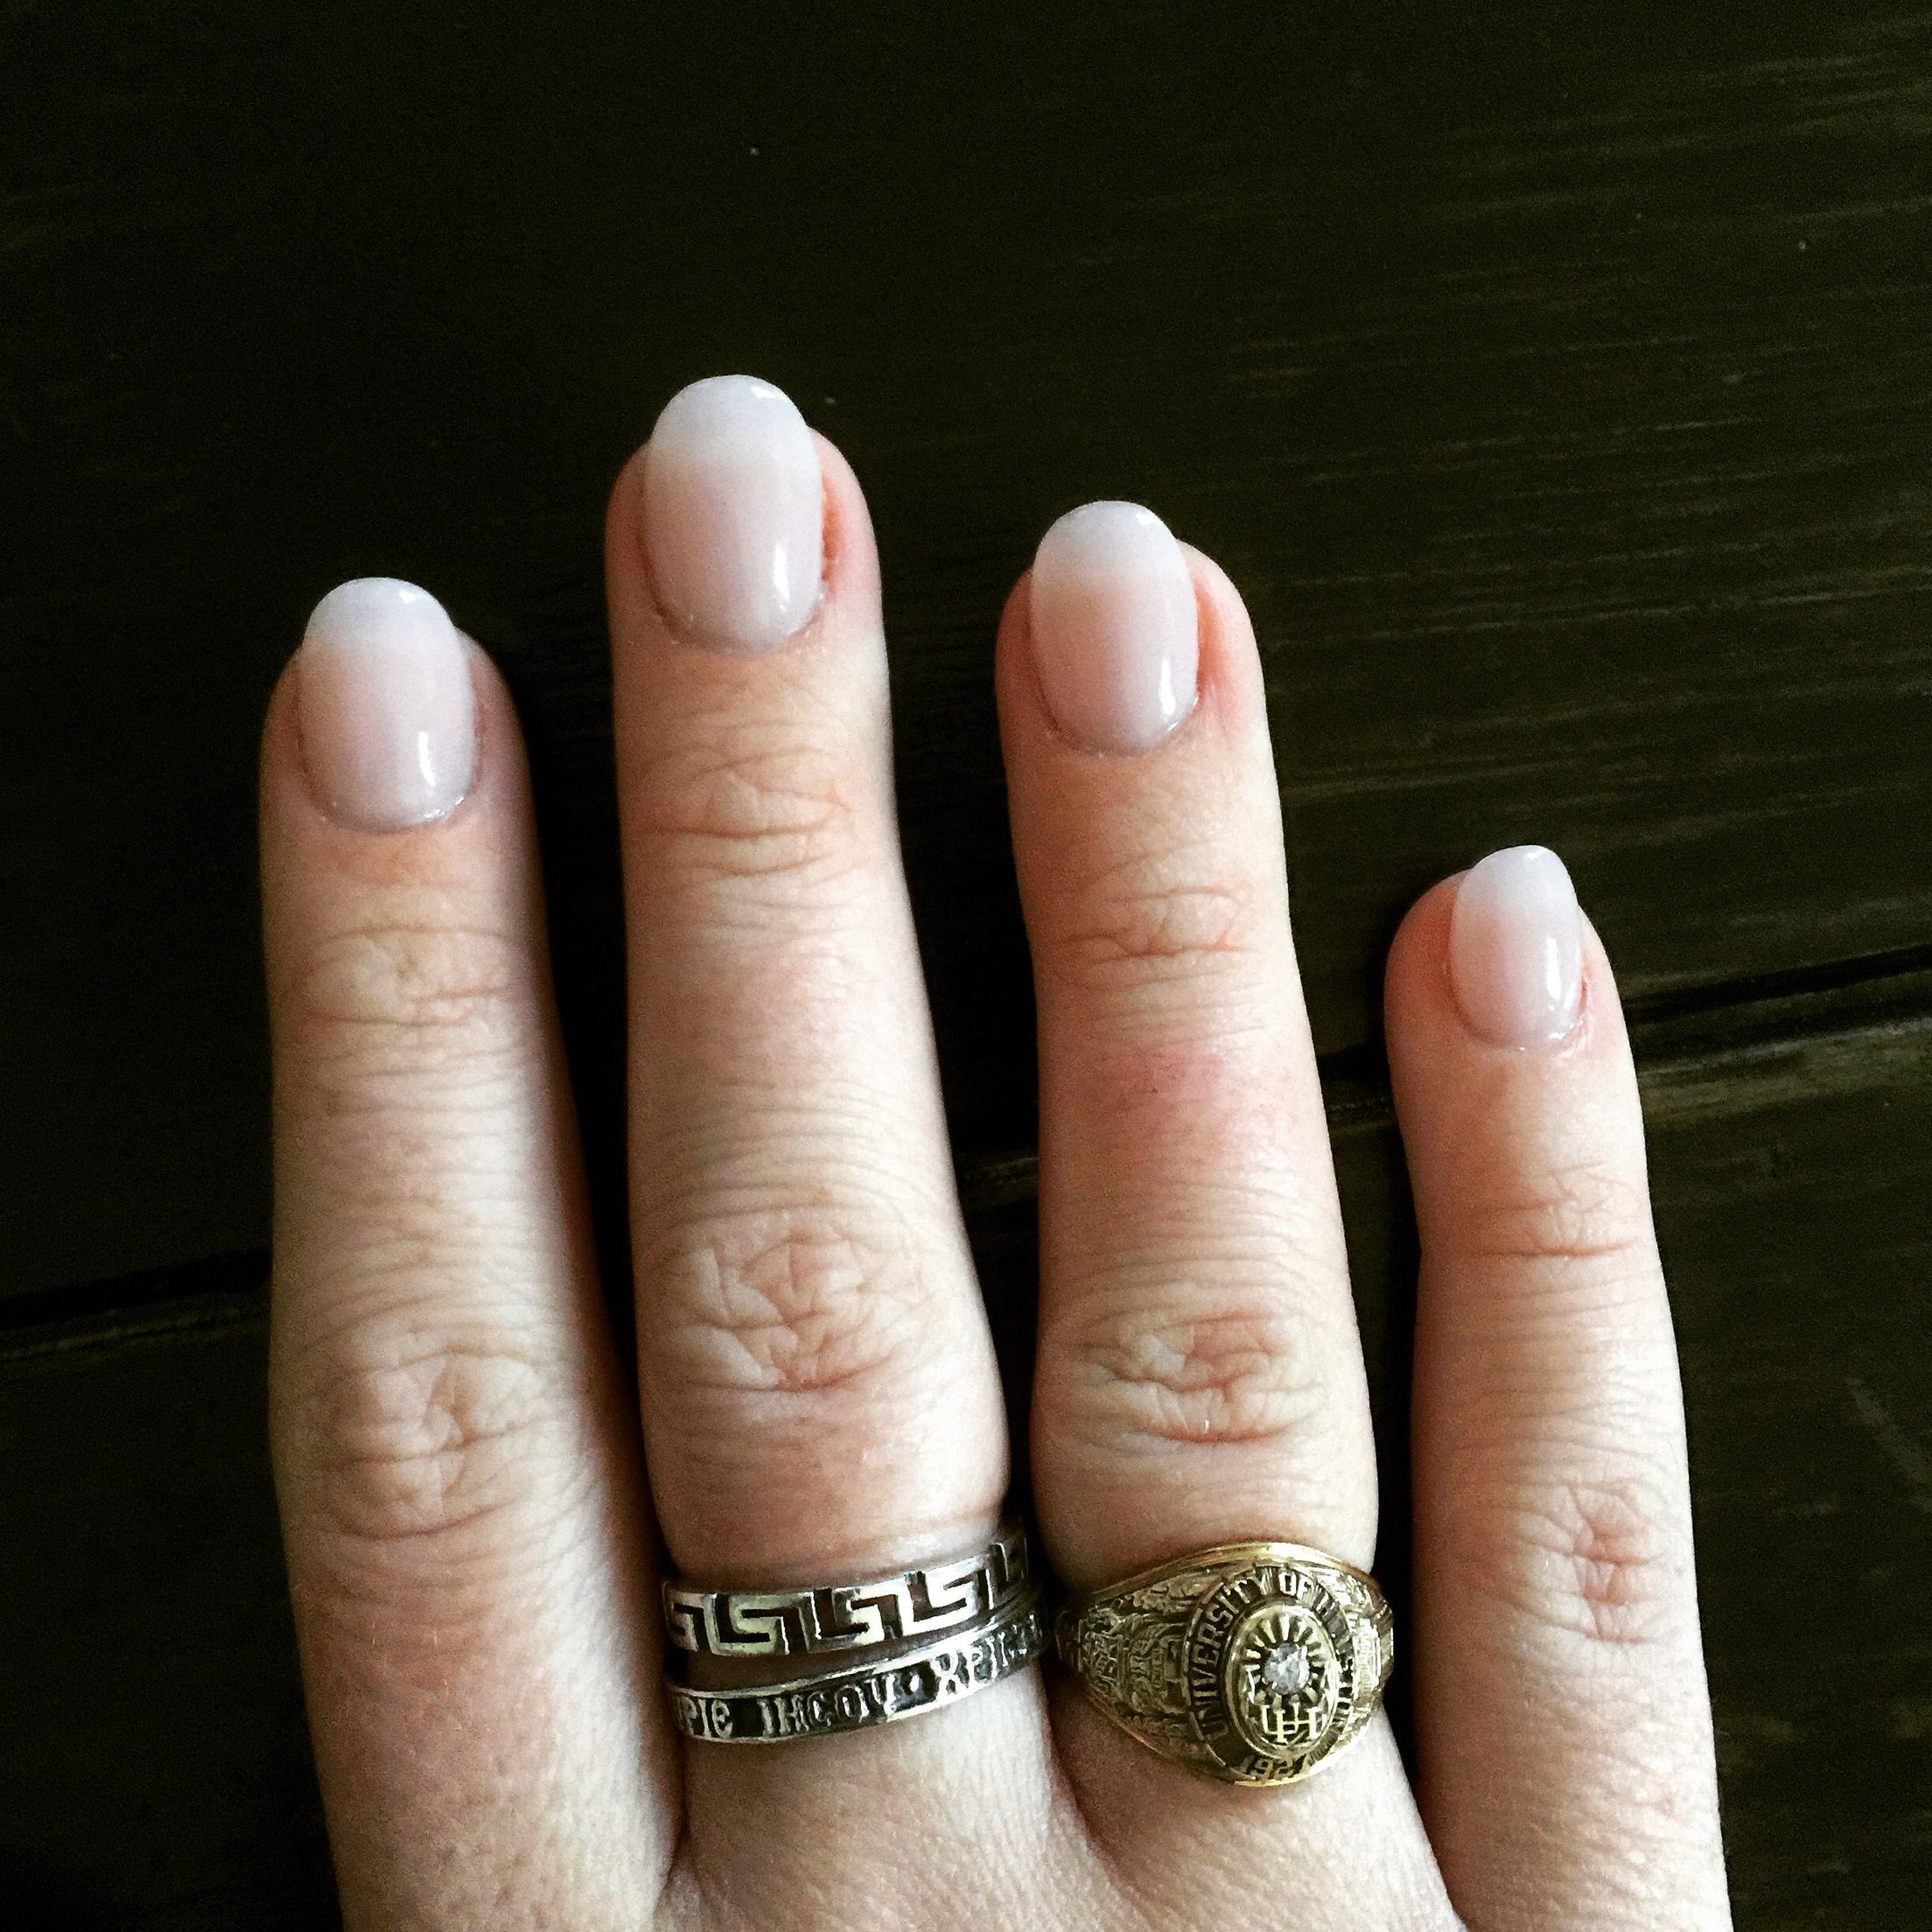 Natural Pink Rounded Acrylic Nails